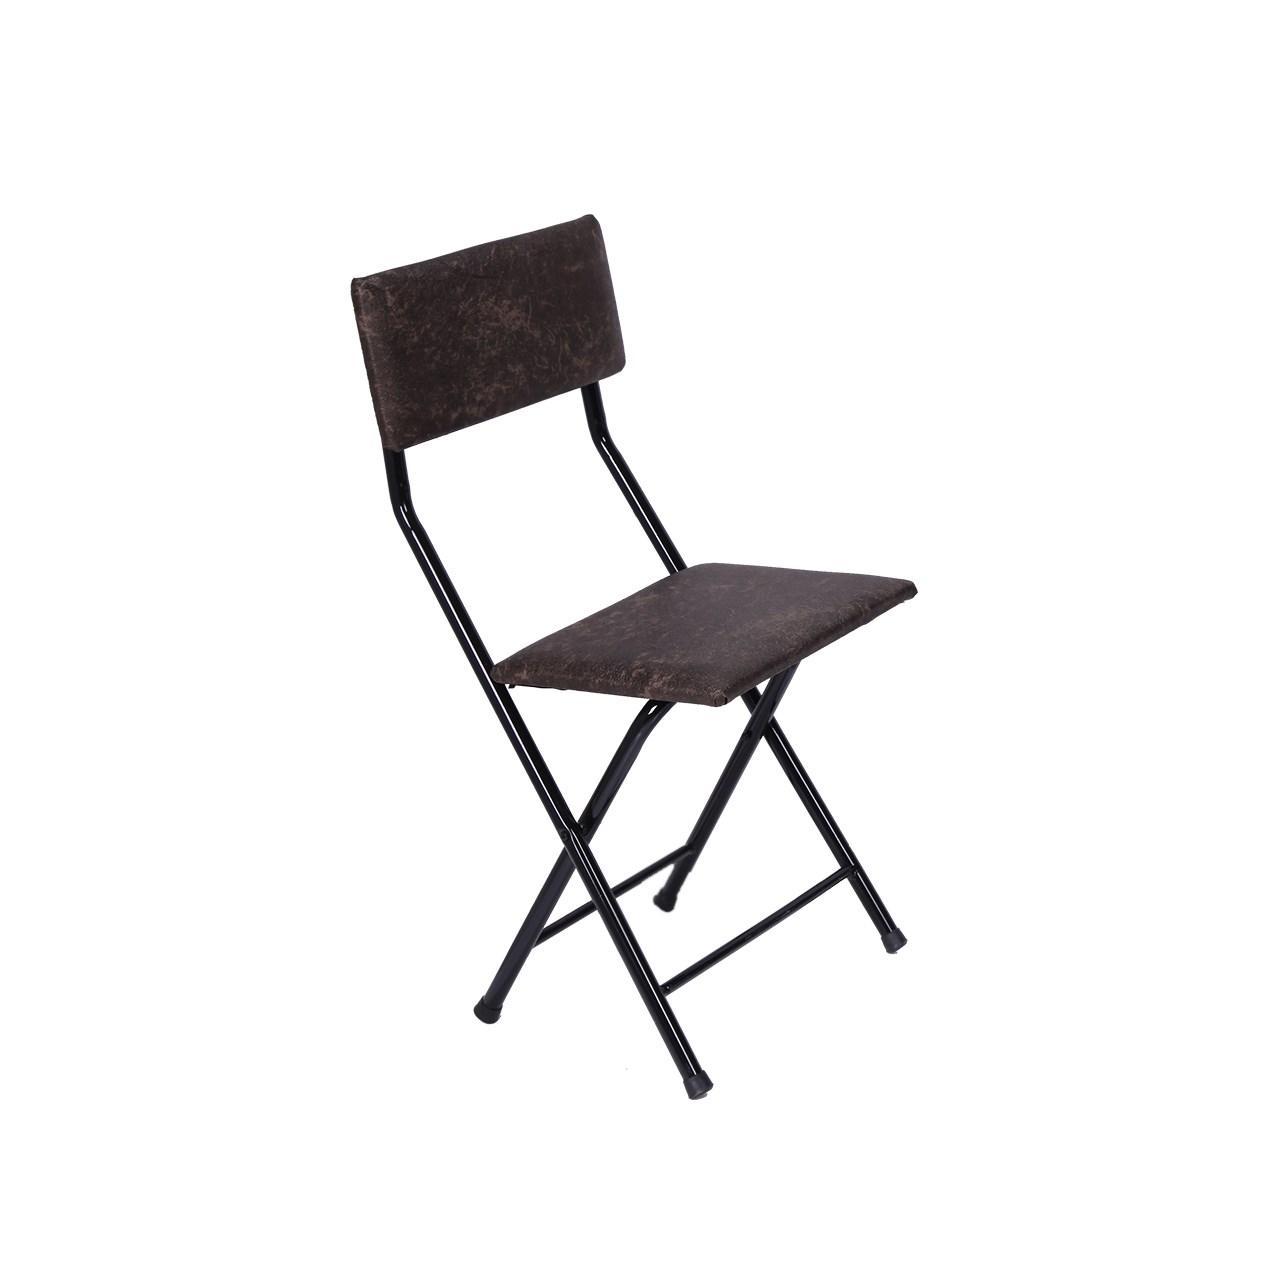 صندلی تاشو یاس مدل a1